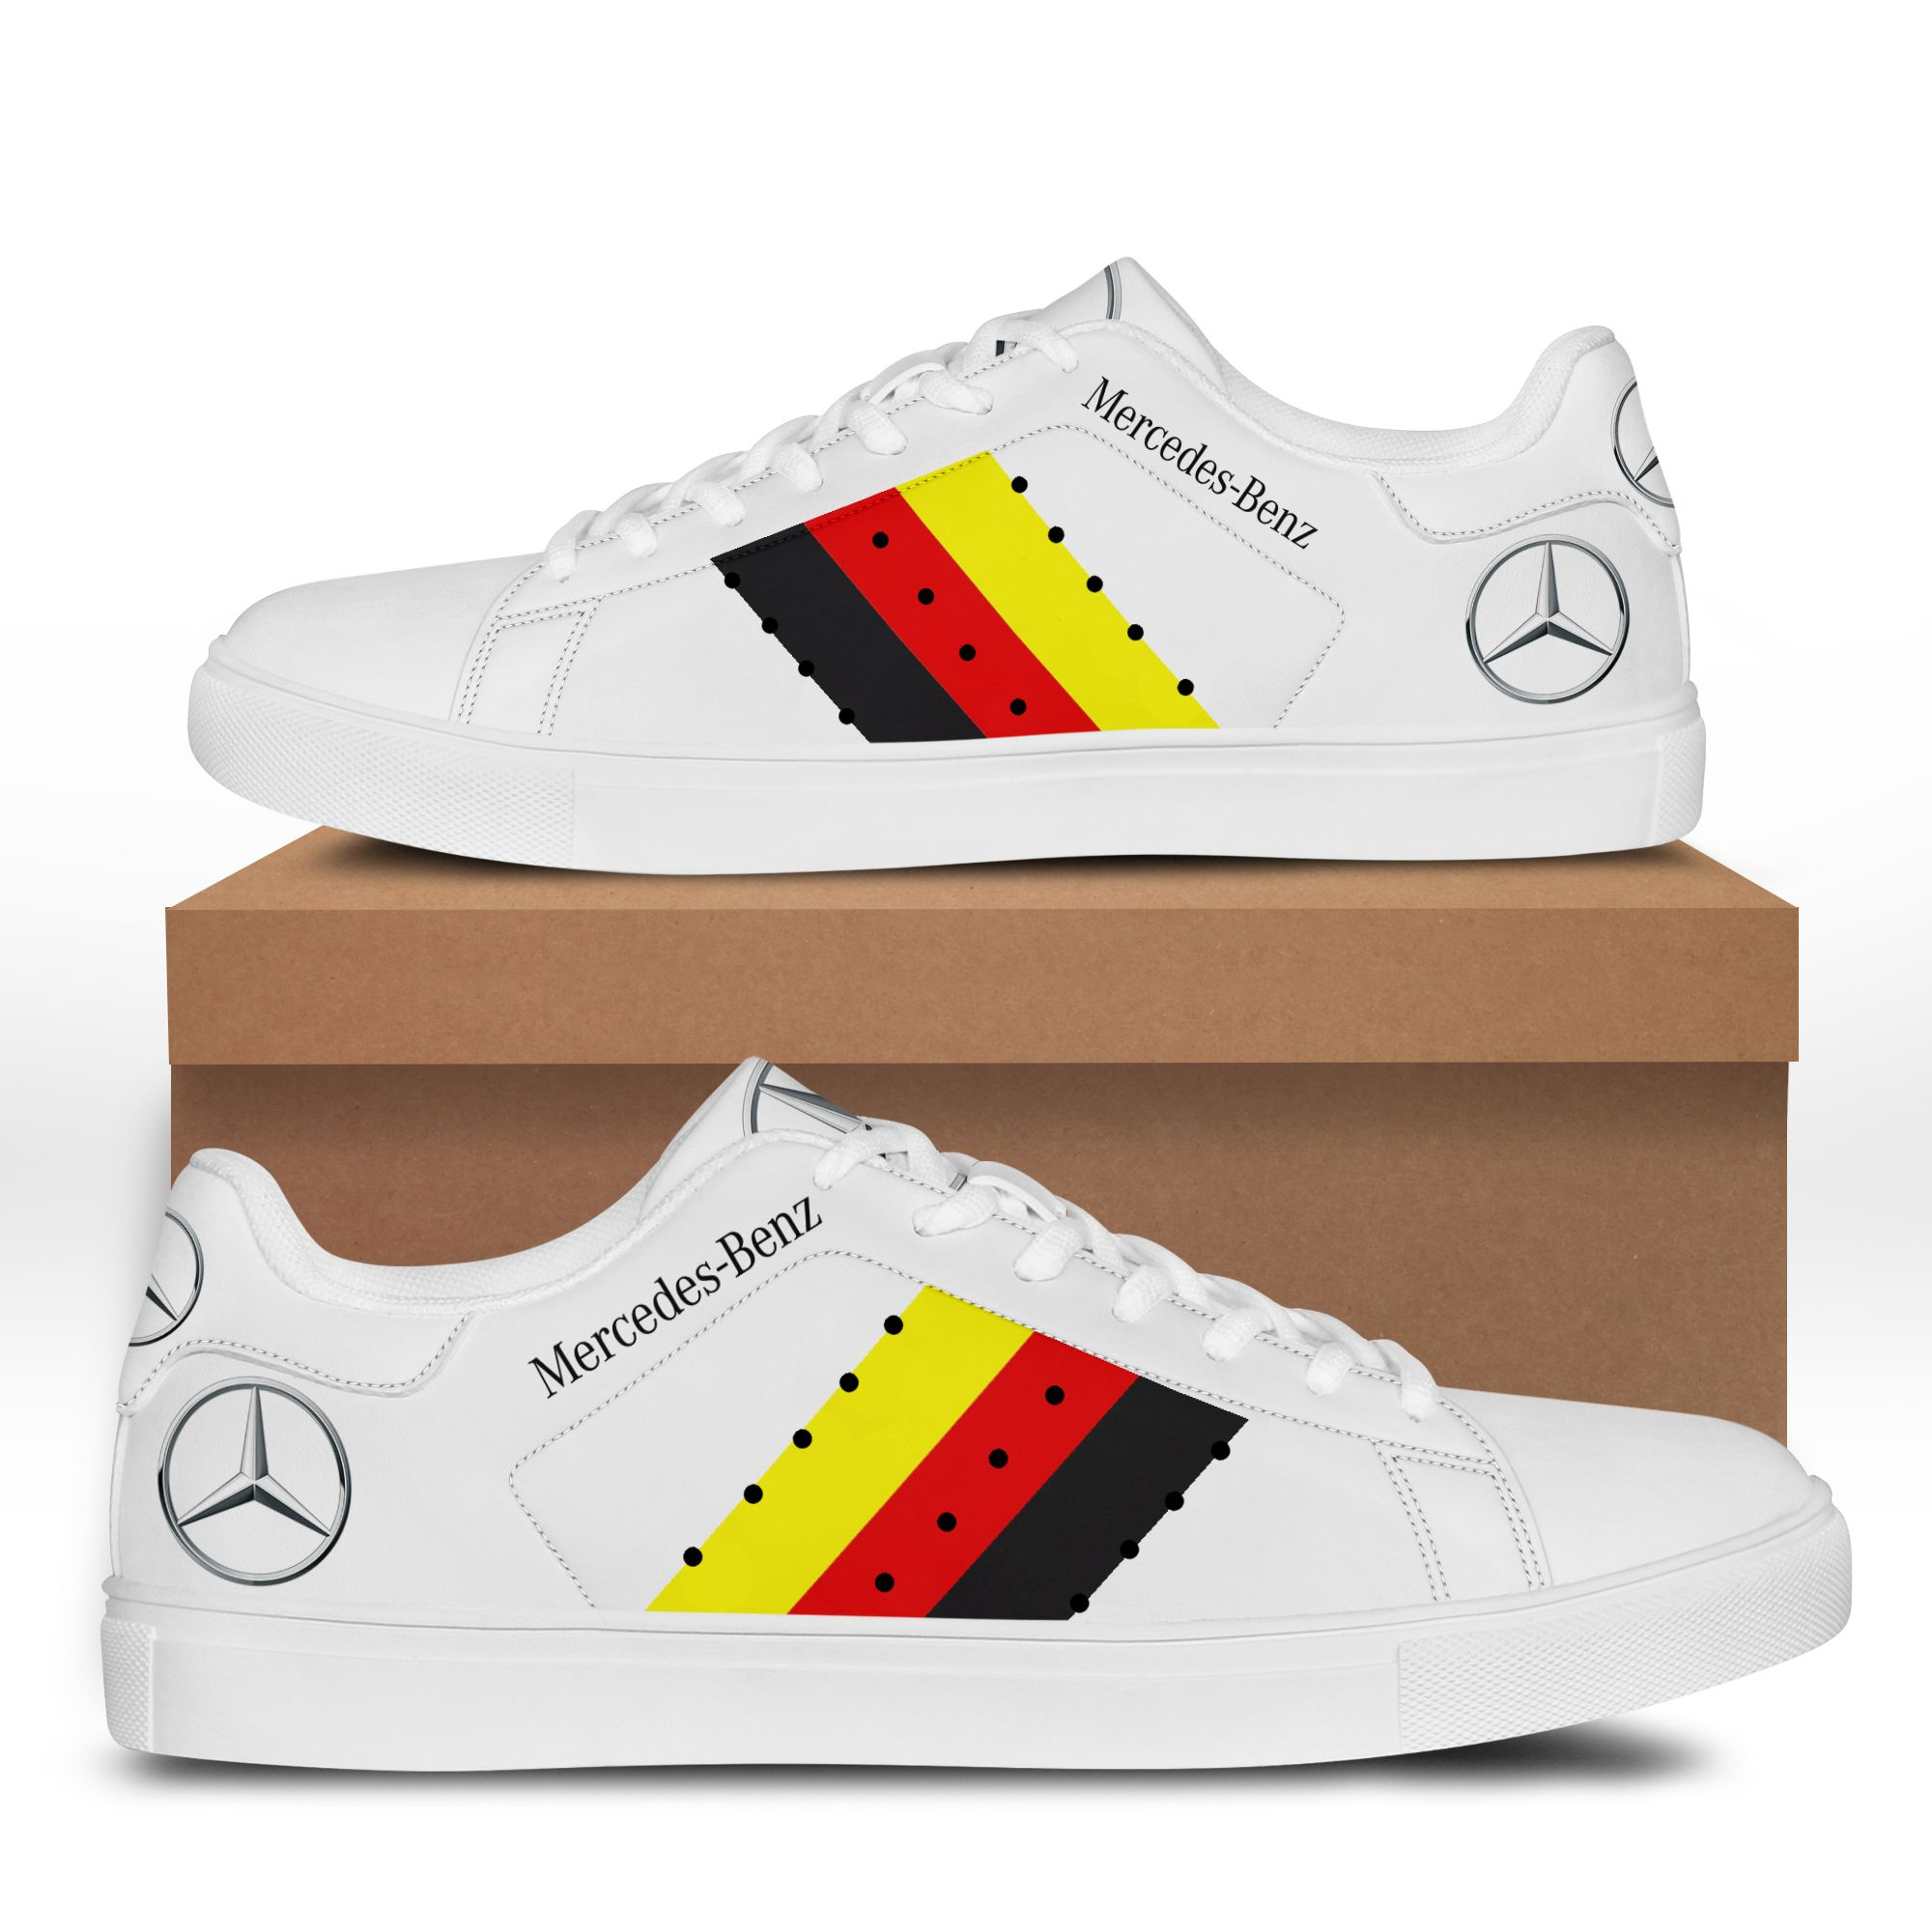 Mercedes Benz White Stan Smith Shoes